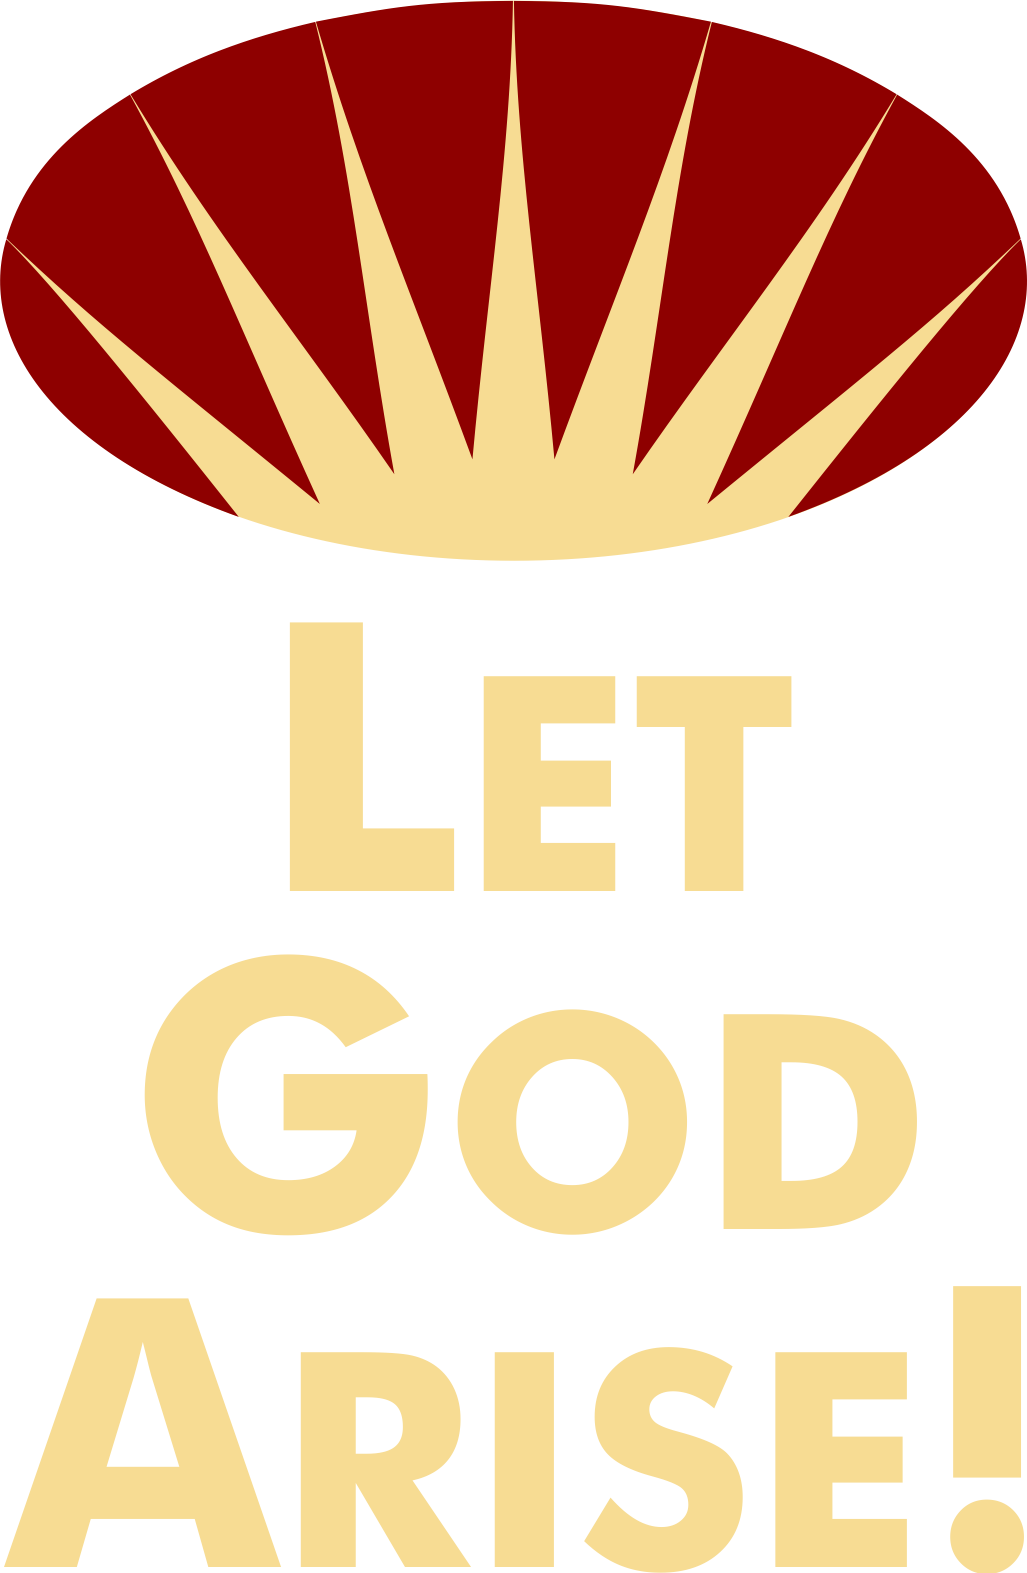 Gate clipart god's kingdom. Tumi org let god